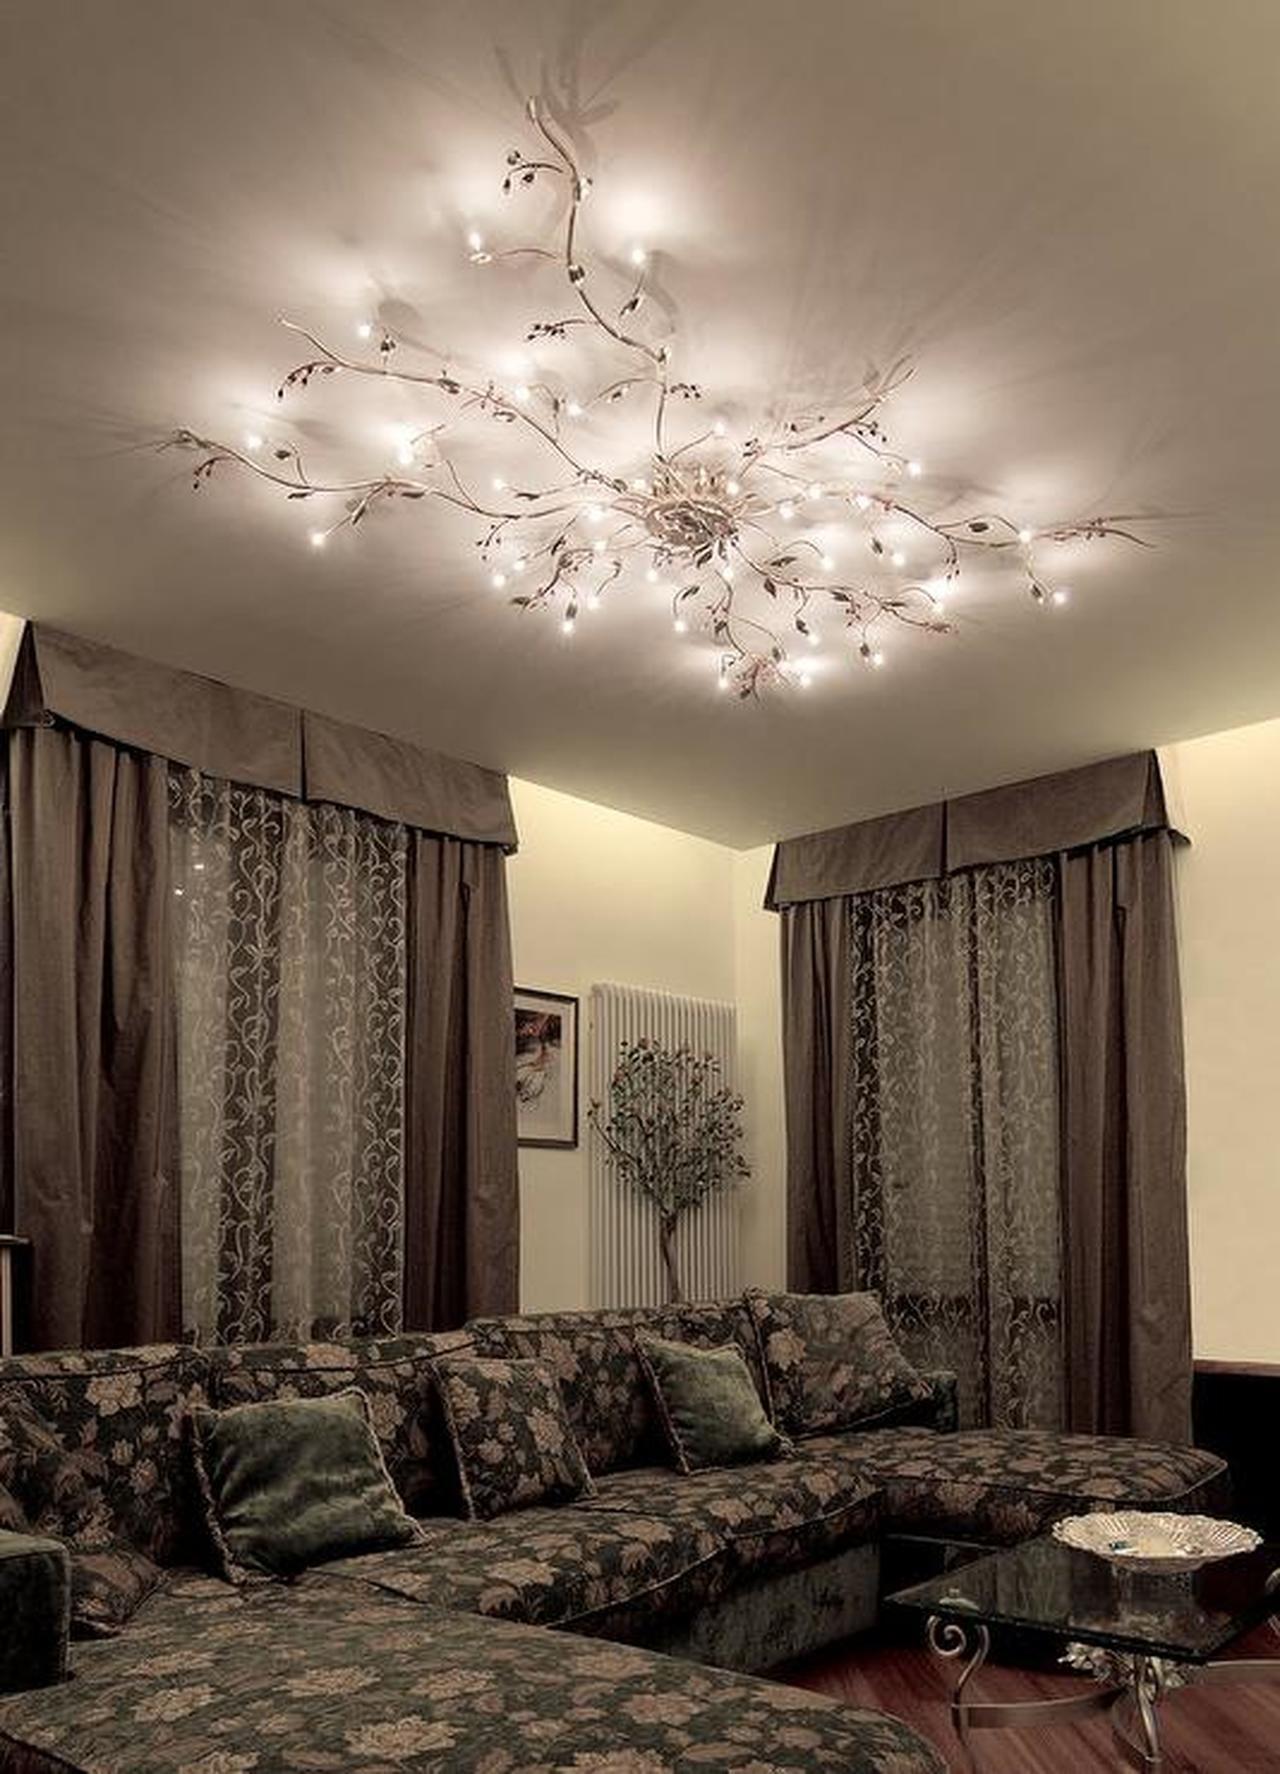 gradara living room lighting living room lighting ideas on extraordinary living room ideas with lighting id=57233